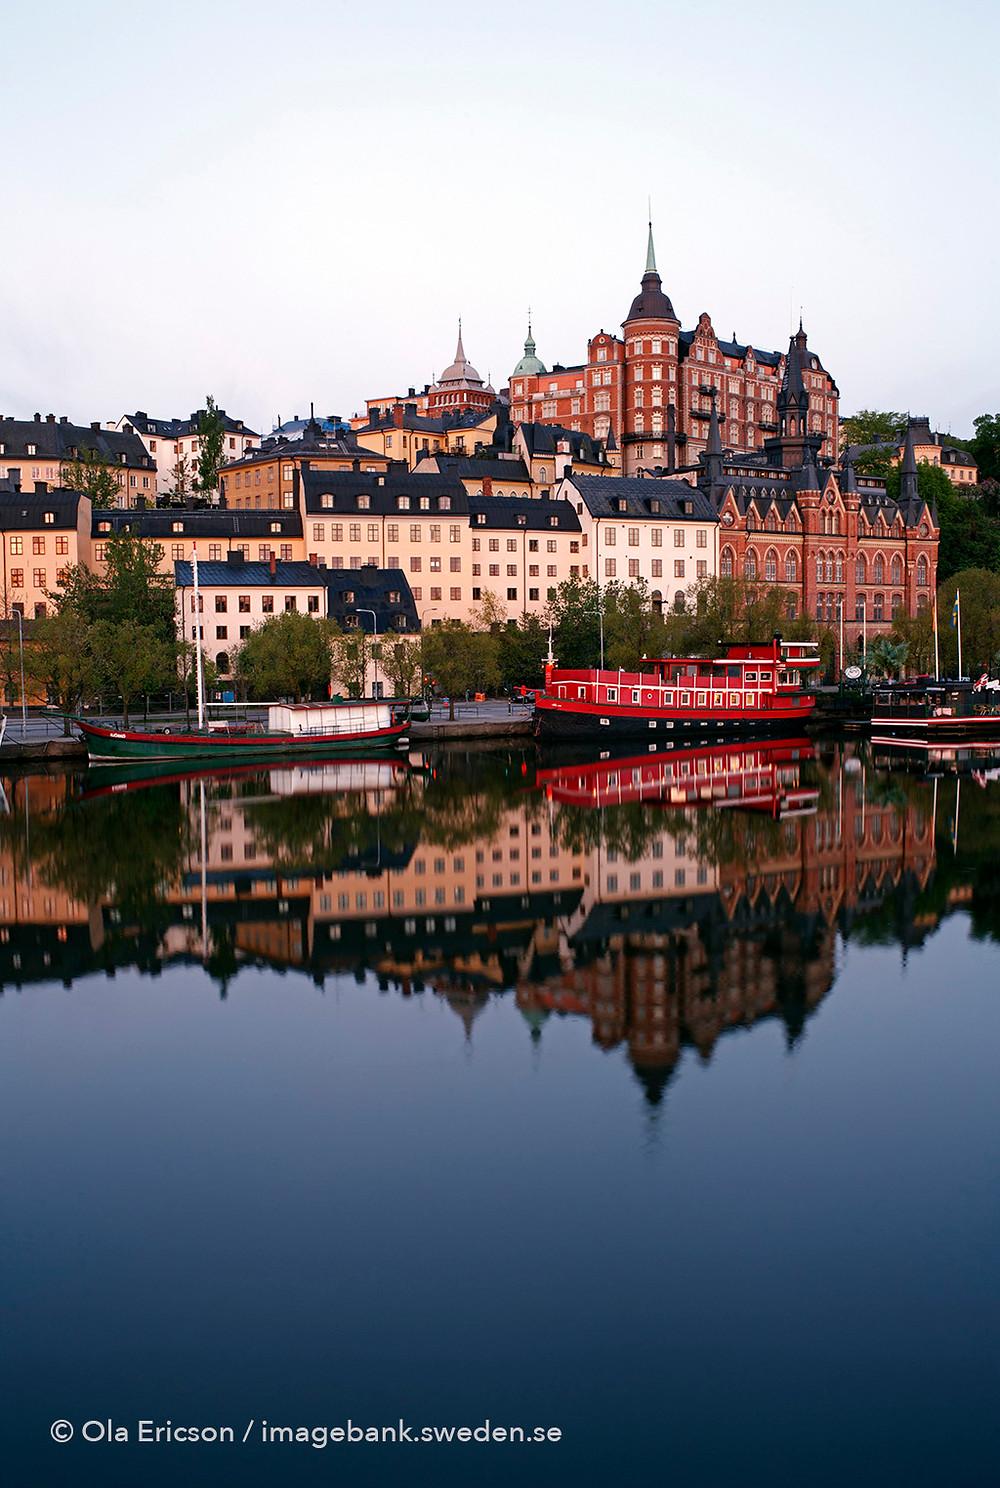 Hills of Södermalm, photo by Ola Ericson / imagebank.sweden.se